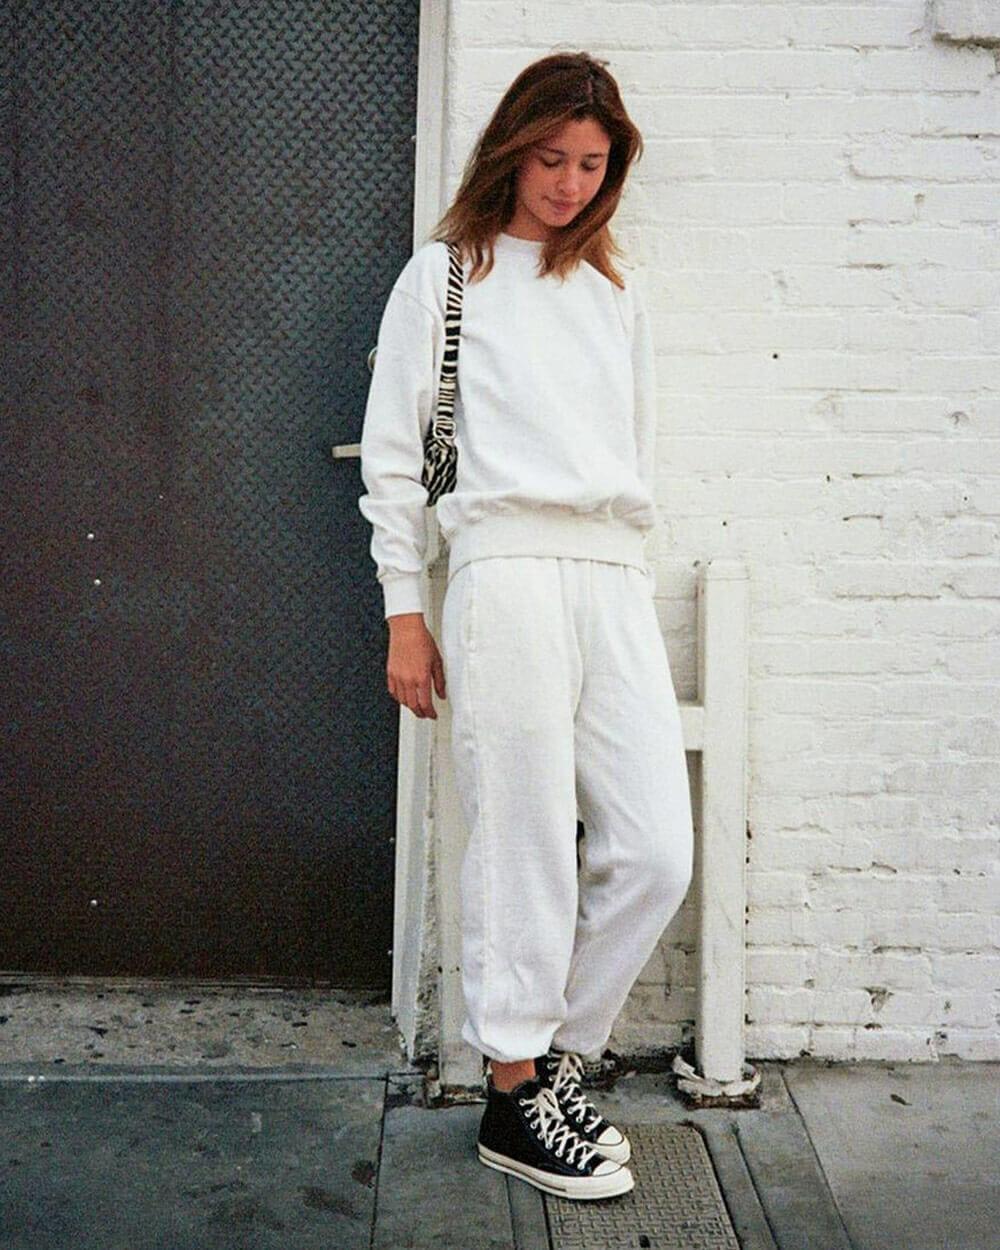 BRANDY MELVILLE petite clothing